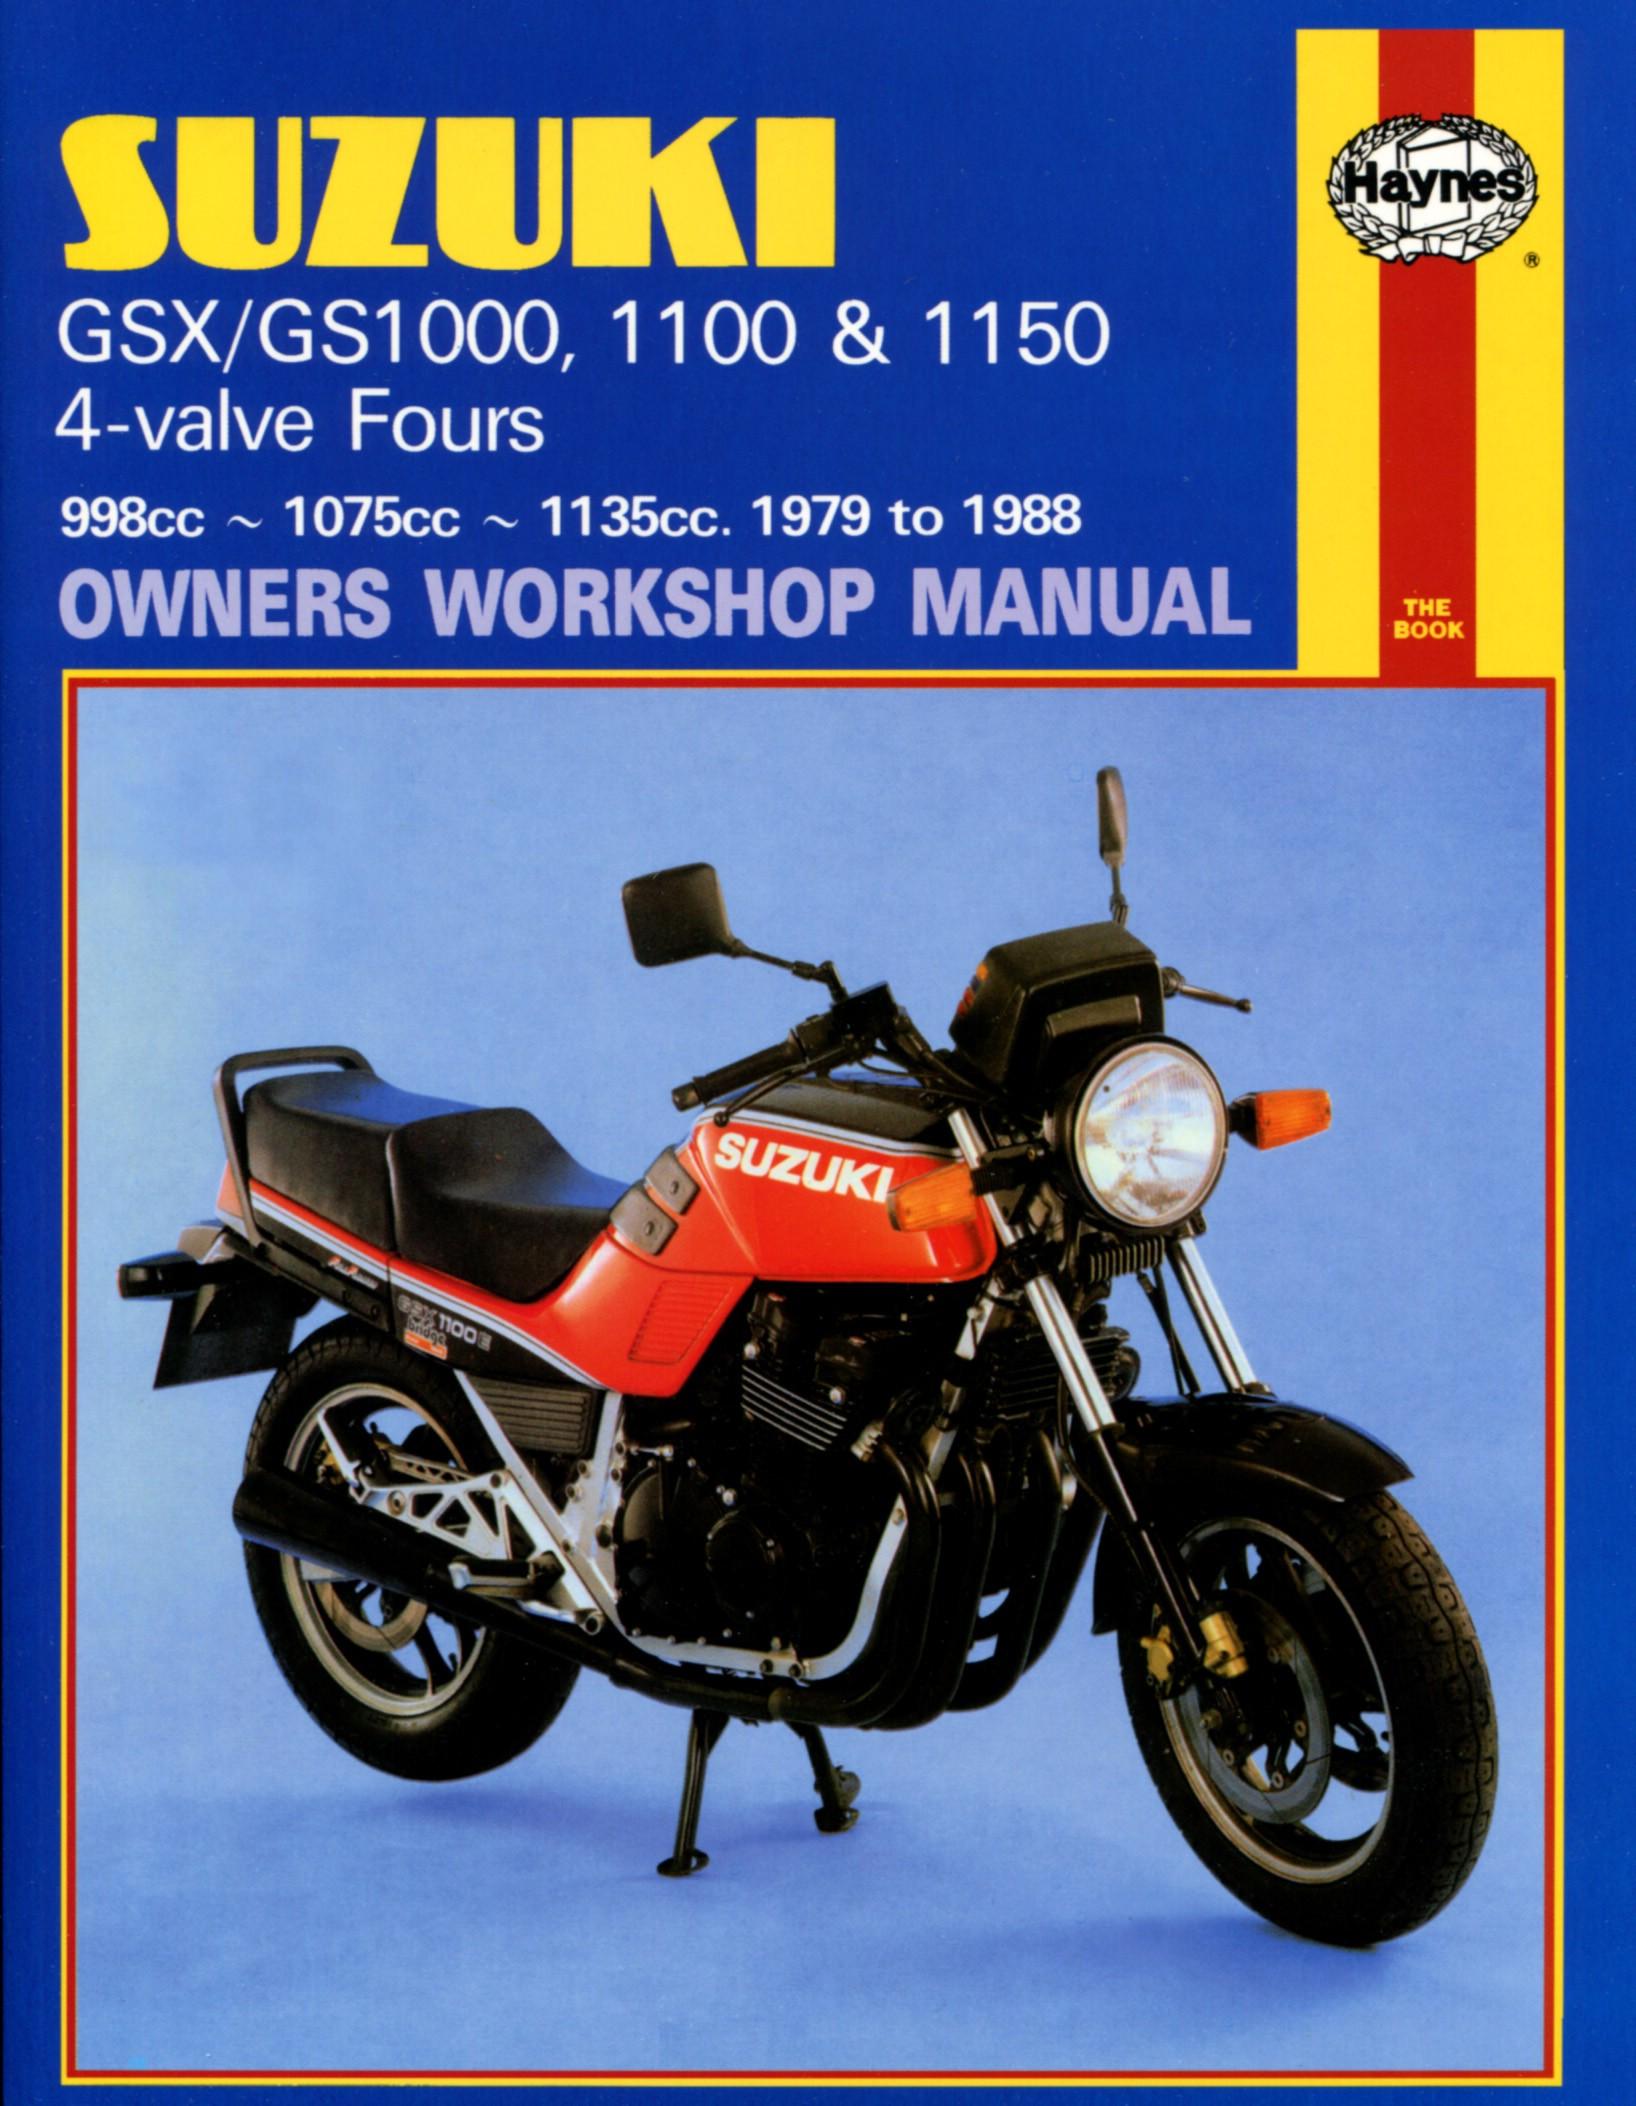 suzuki gsx 1100 s katana uk 1982 1984 manuals haynes each ebay rh ebay co  uk 2019 Suzuki Katana suzuki gsx 1100 katana service manual